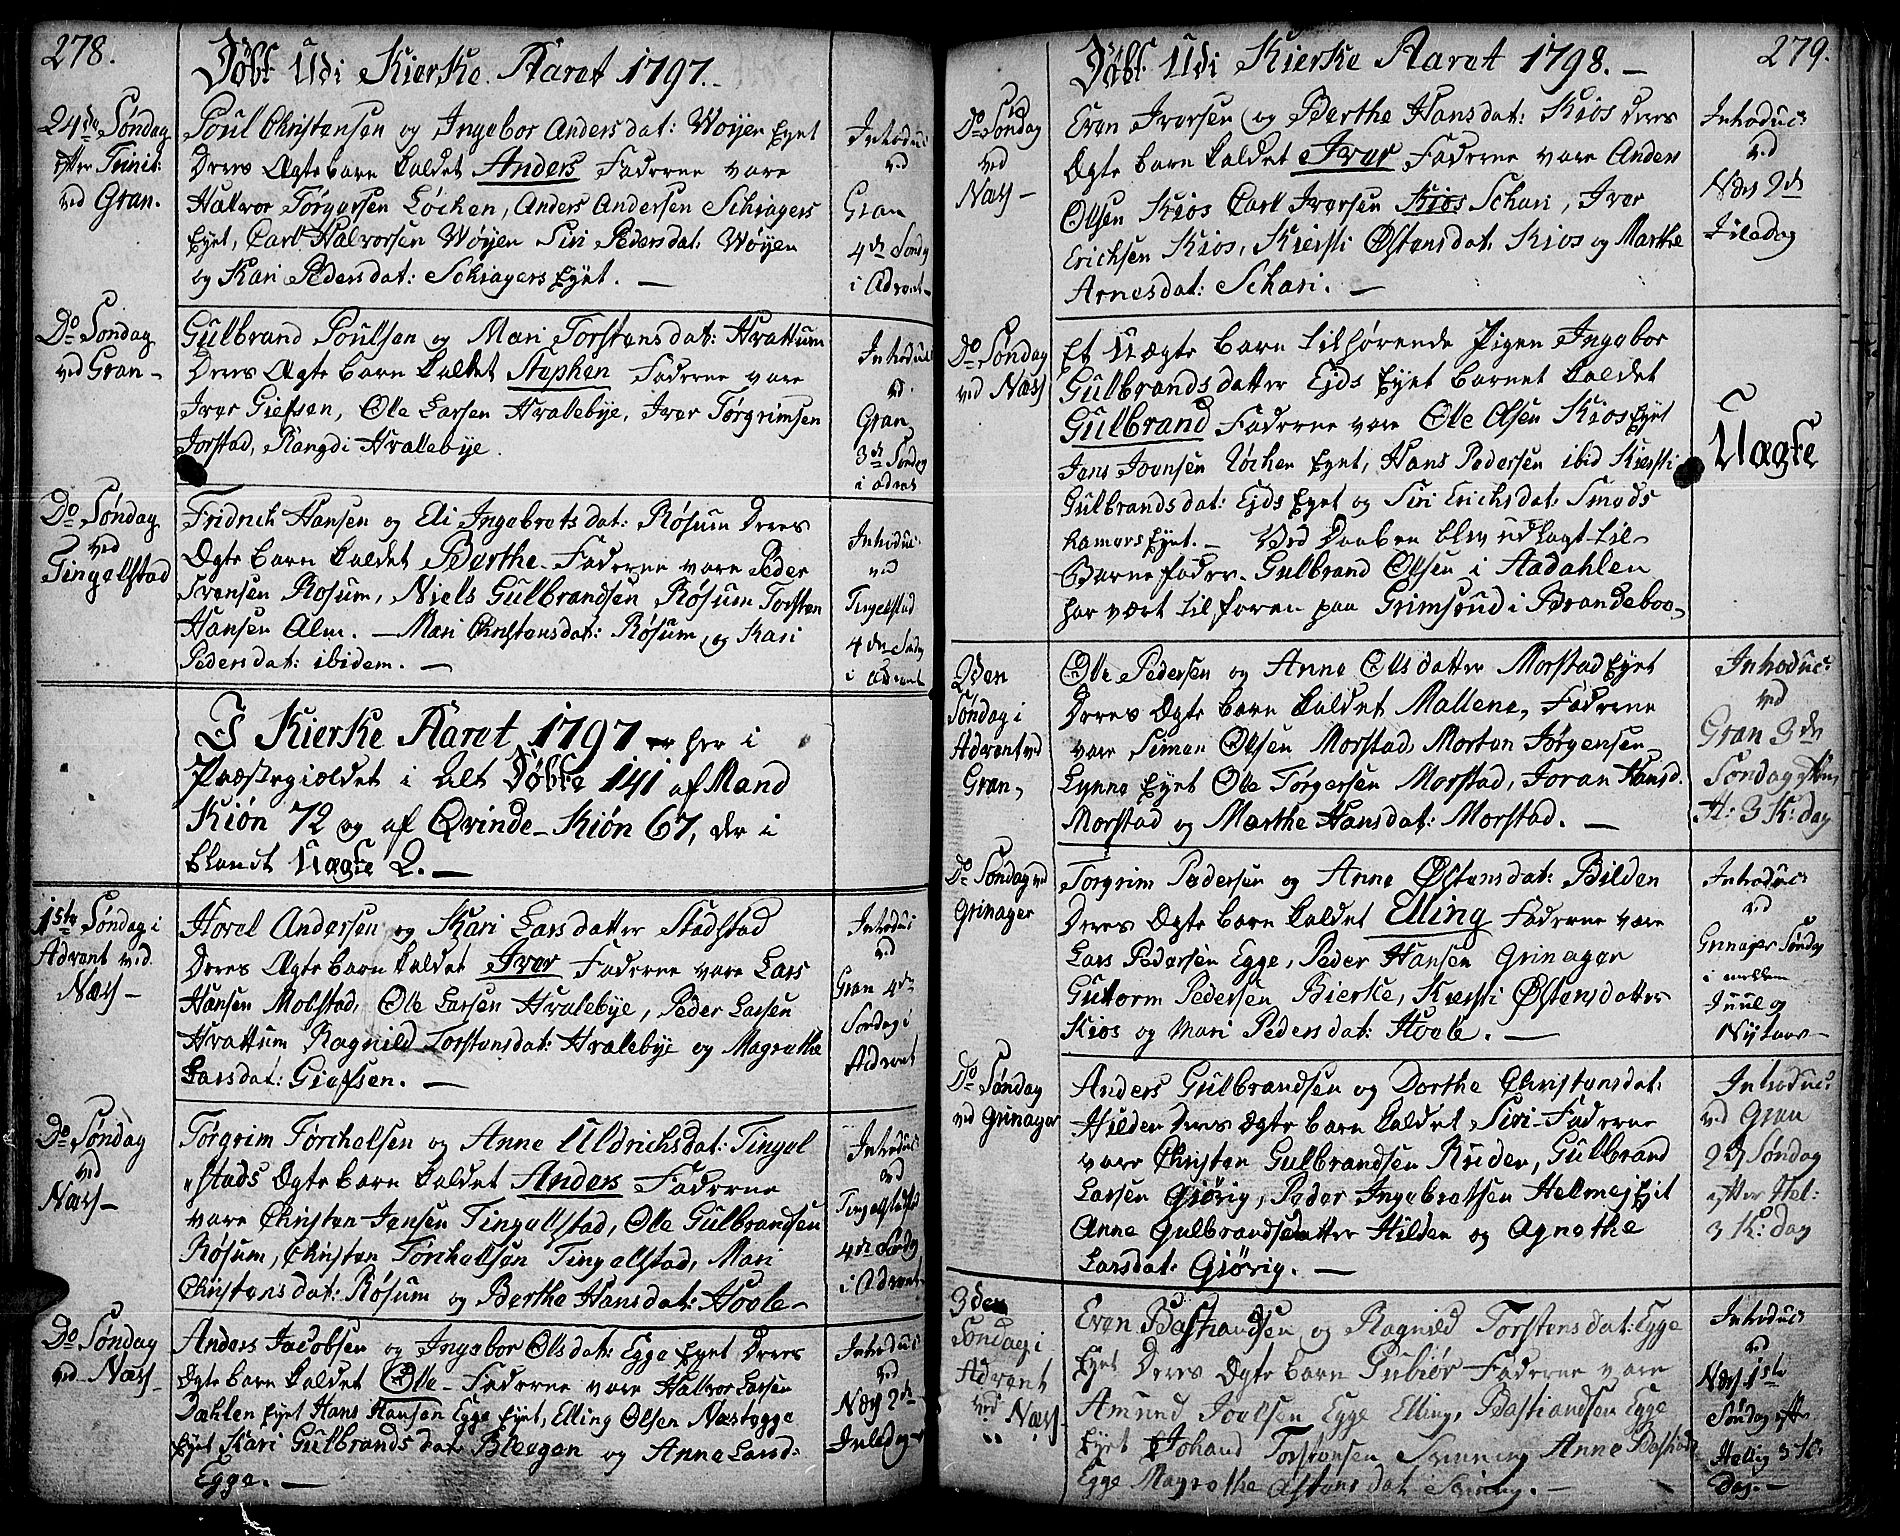 SAH, Gran prestekontor, Ministerialbok nr. 6, 1787-1824, s. 278-279